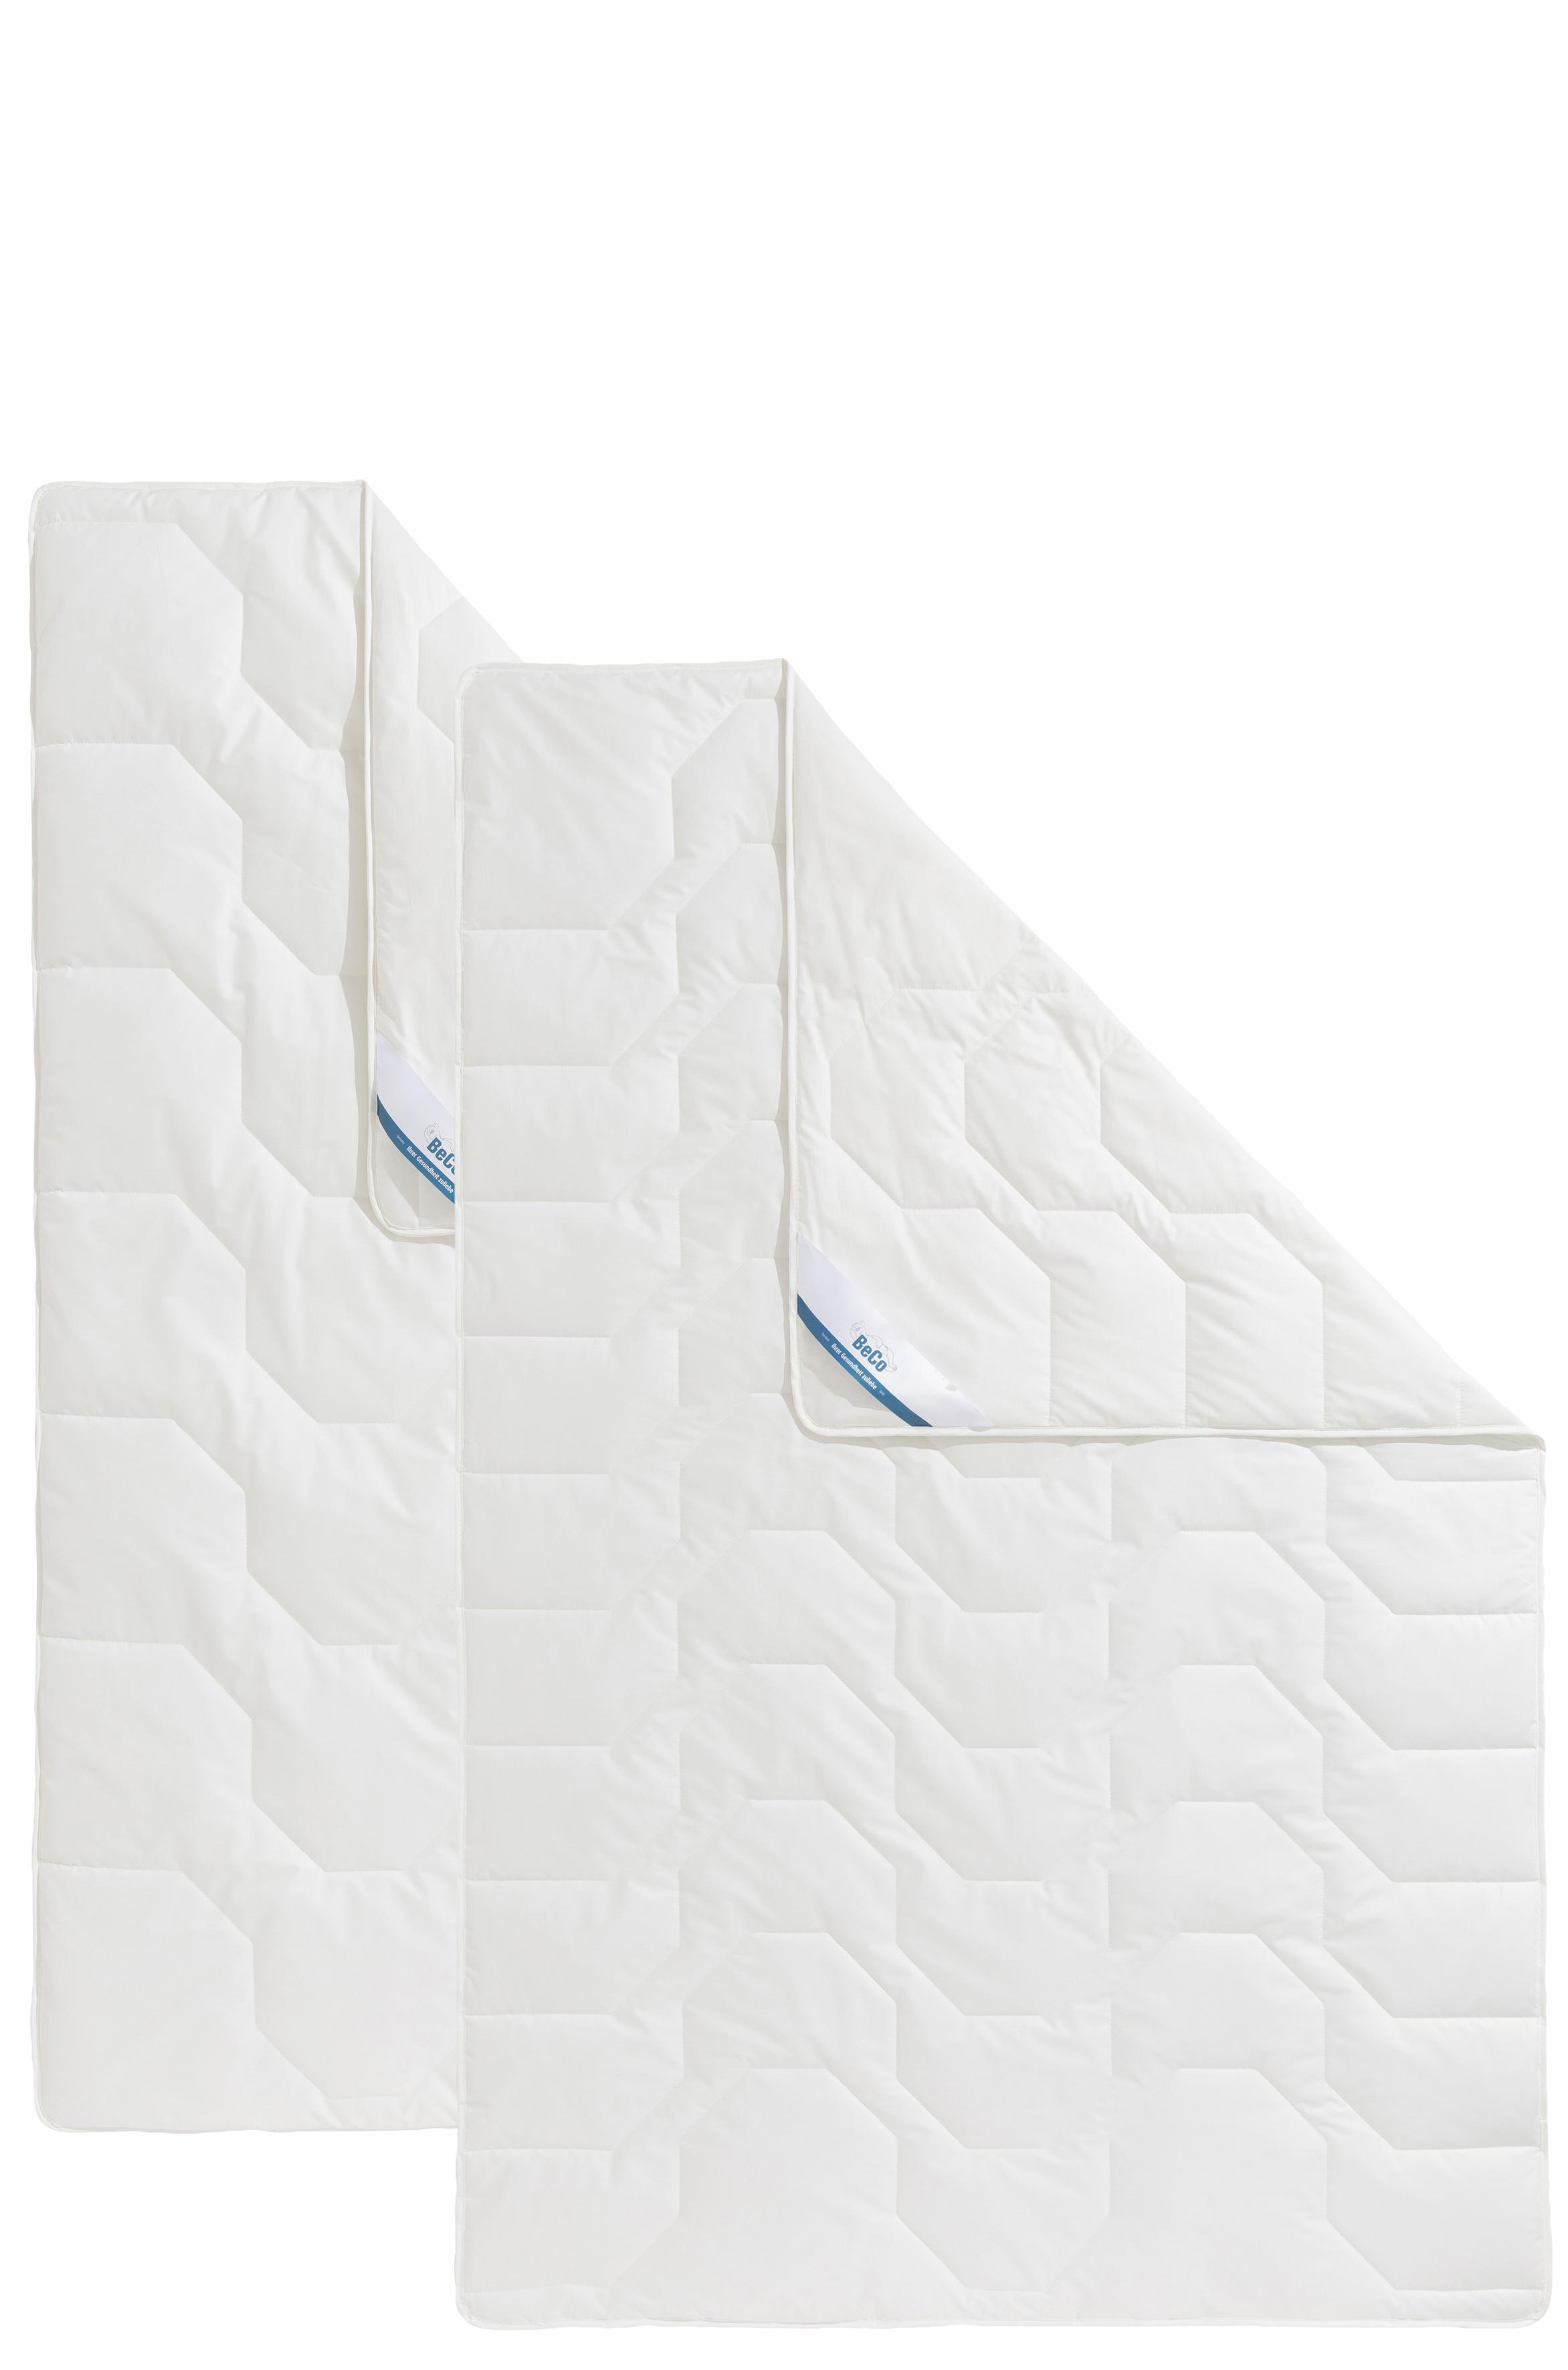 Bettdecke TENCEL KbA BeCo Warm inklusiv Leichtdecke gratis nachhaltige Materialien